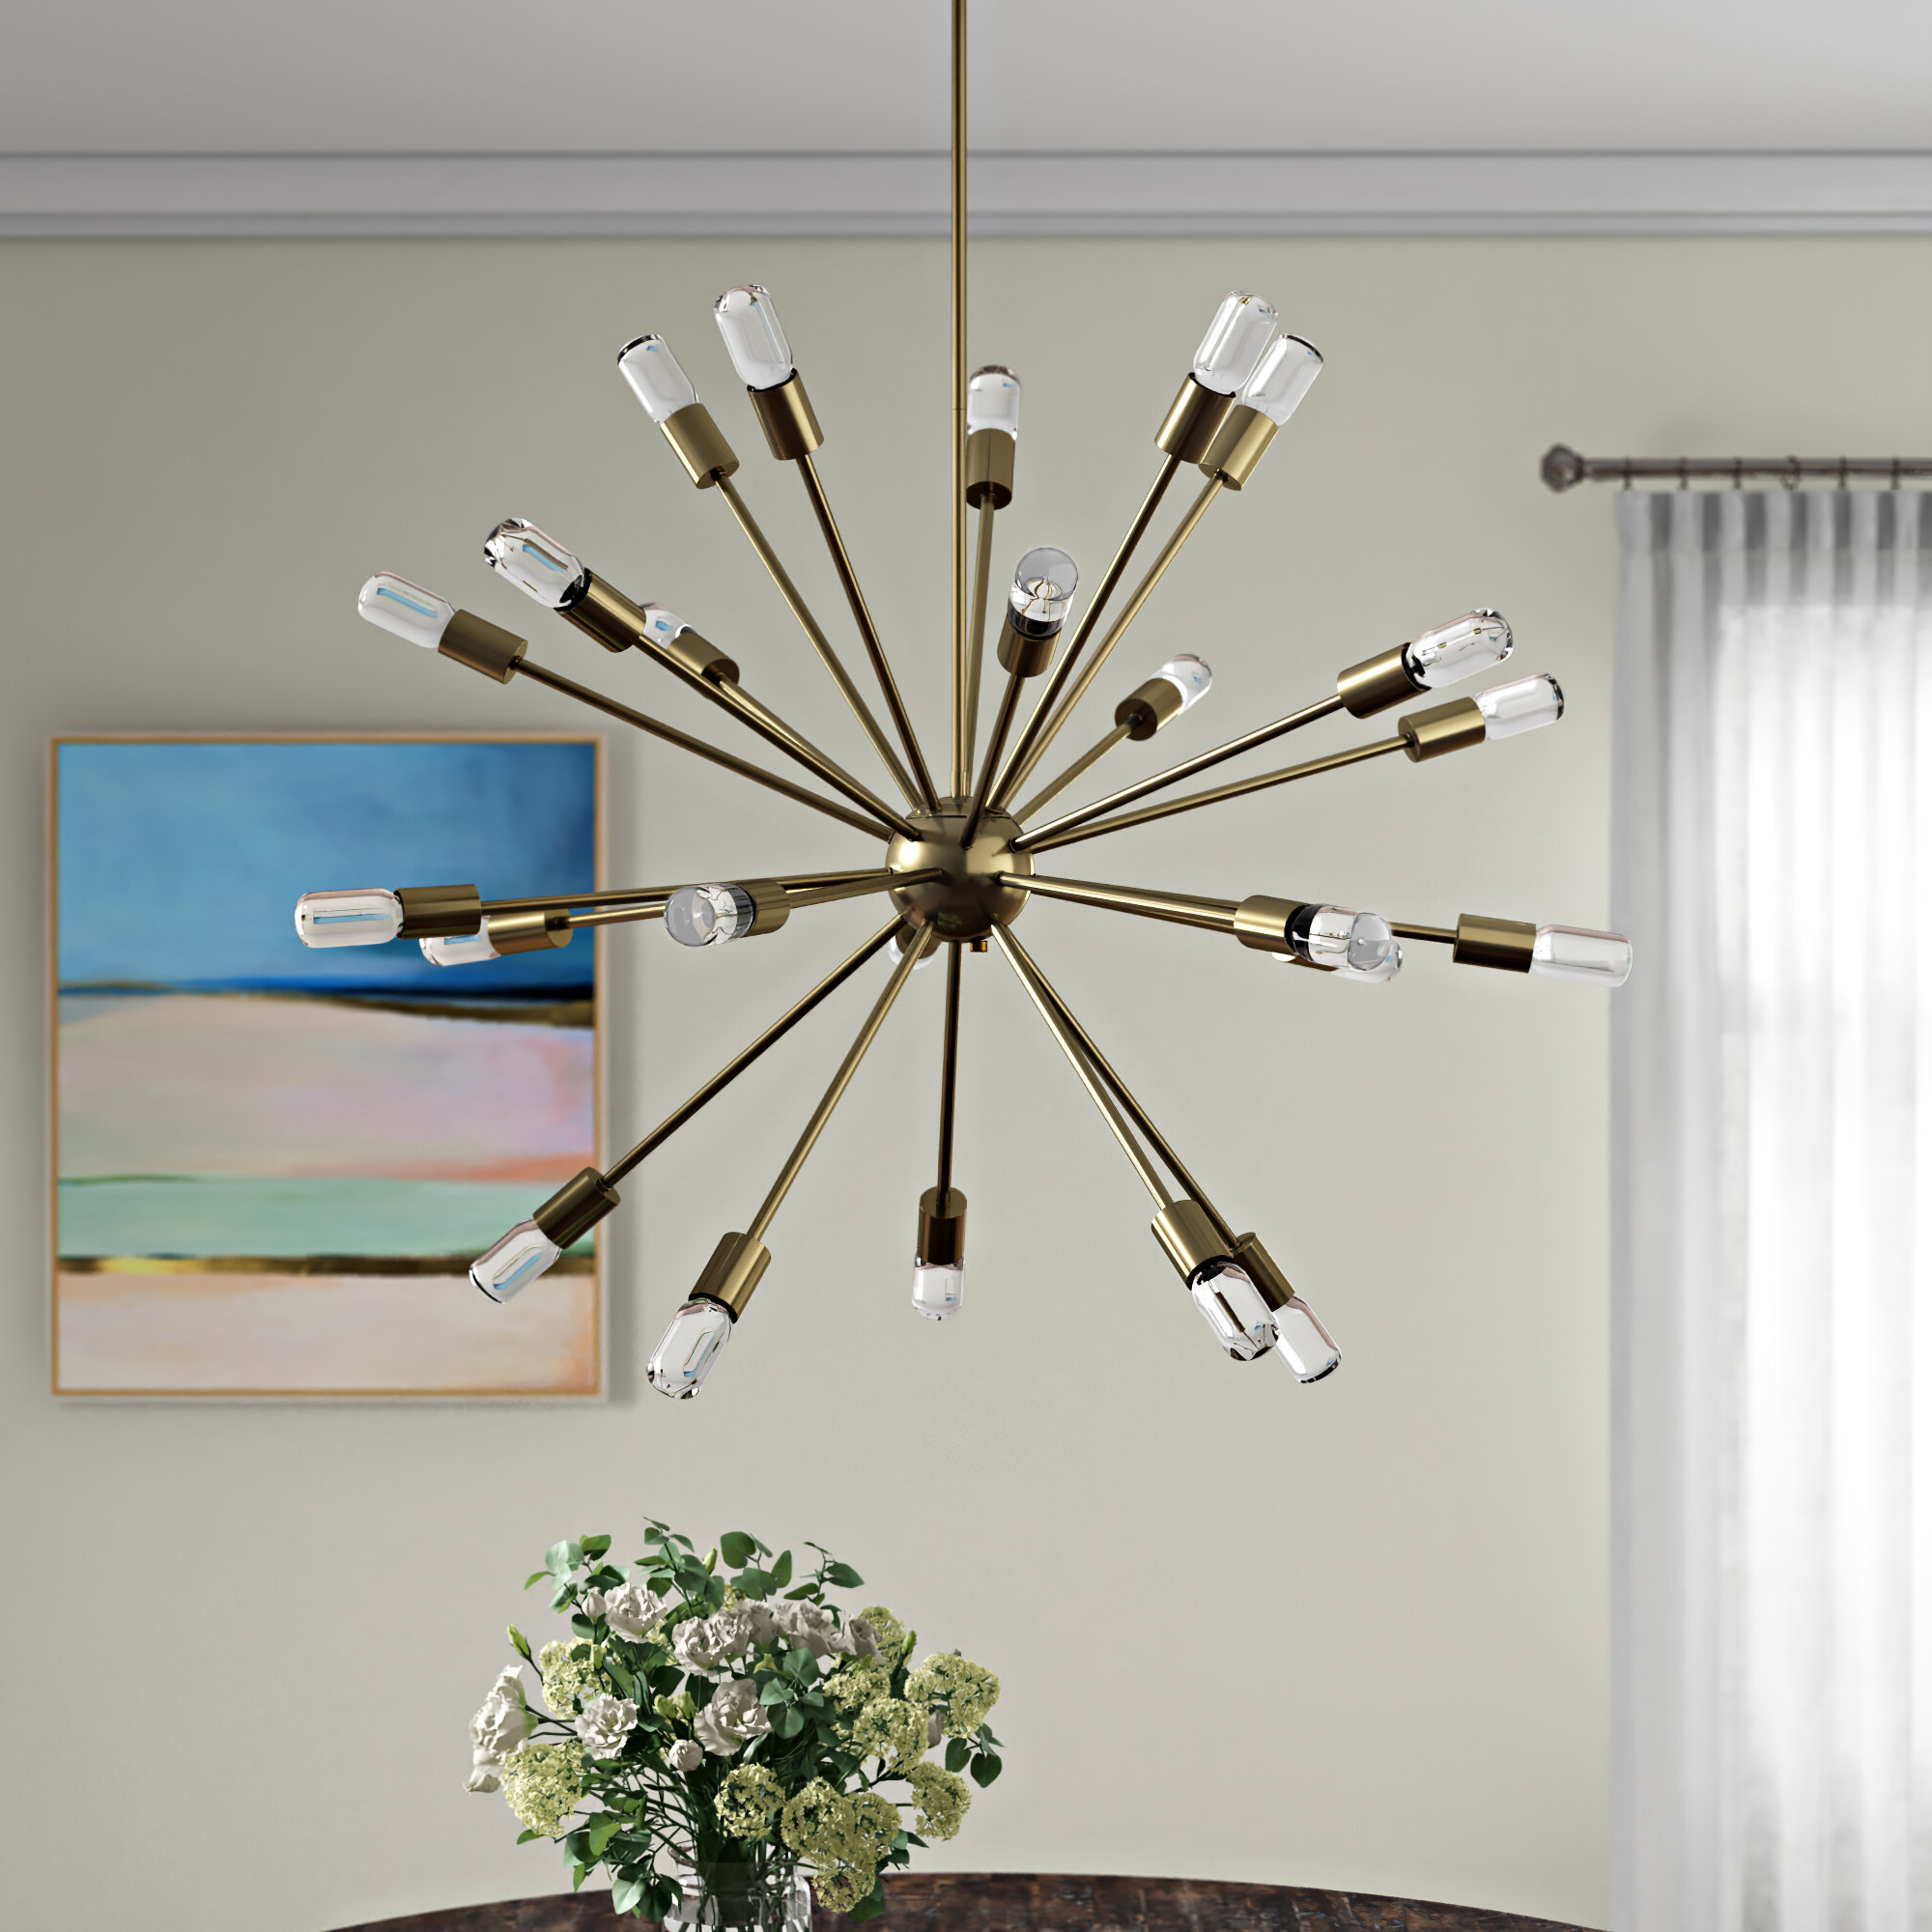 Kendall 24 Light Chandelier For Most Popular Bacchus 12 Light Sputnik Chandeliers (Gallery 25 of 25)